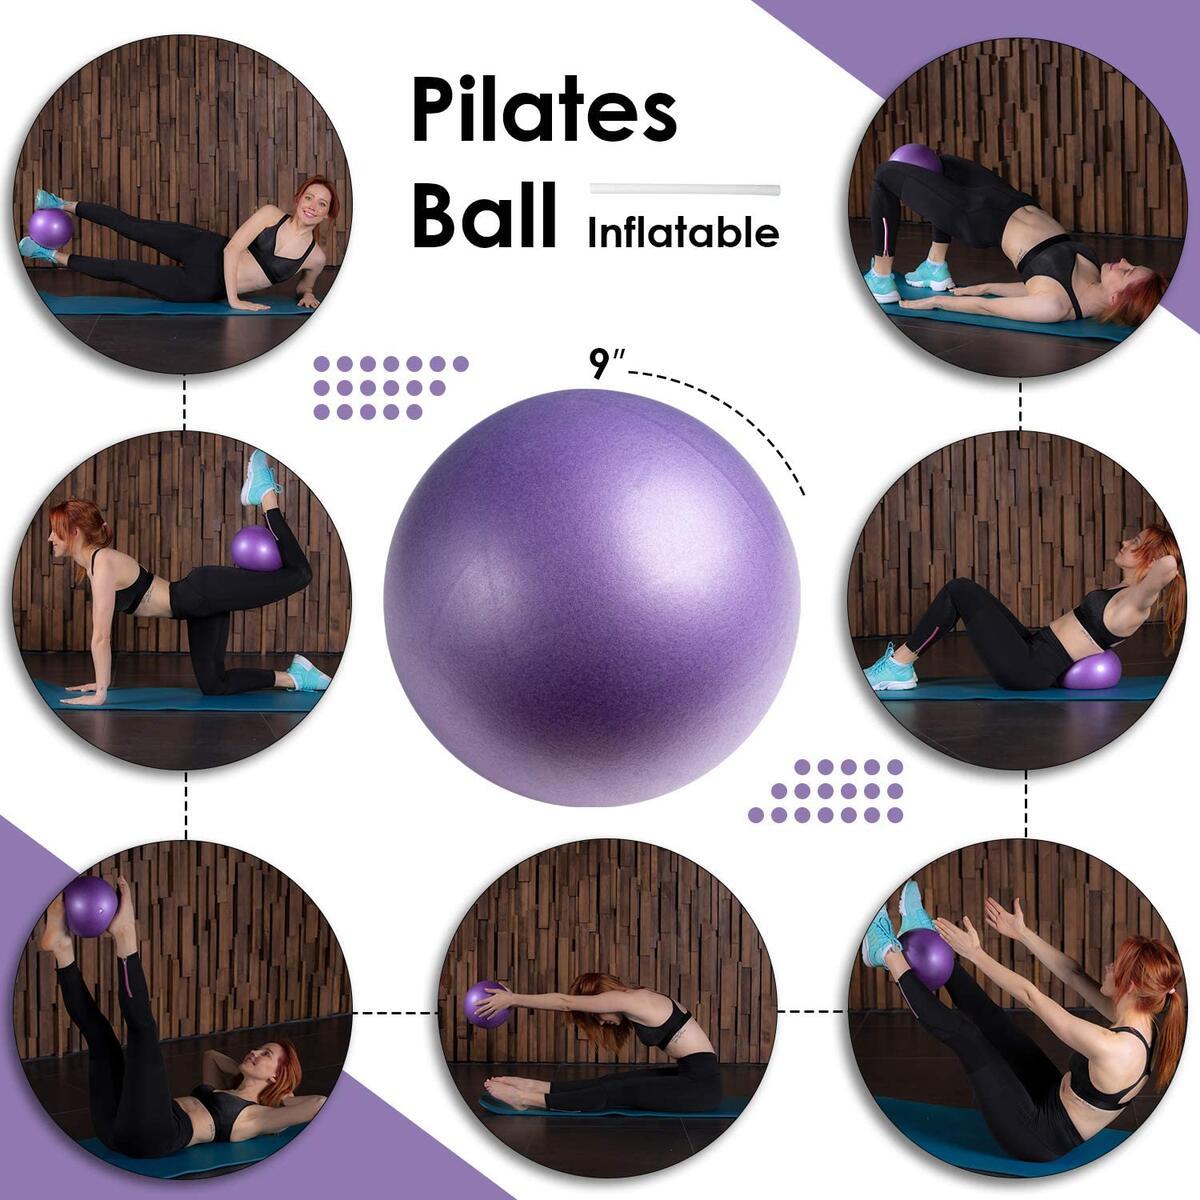 LUSHFIT Pilates Yoga Fitness Set - Pilates Ring - Pilates Ball - Yoga Stretching Strap - Resistance Bands Set - Exercise Bands Set - 8-Shaped Stretch Band, Adjustable Jump Rope - Home Kit (23 Pcs)